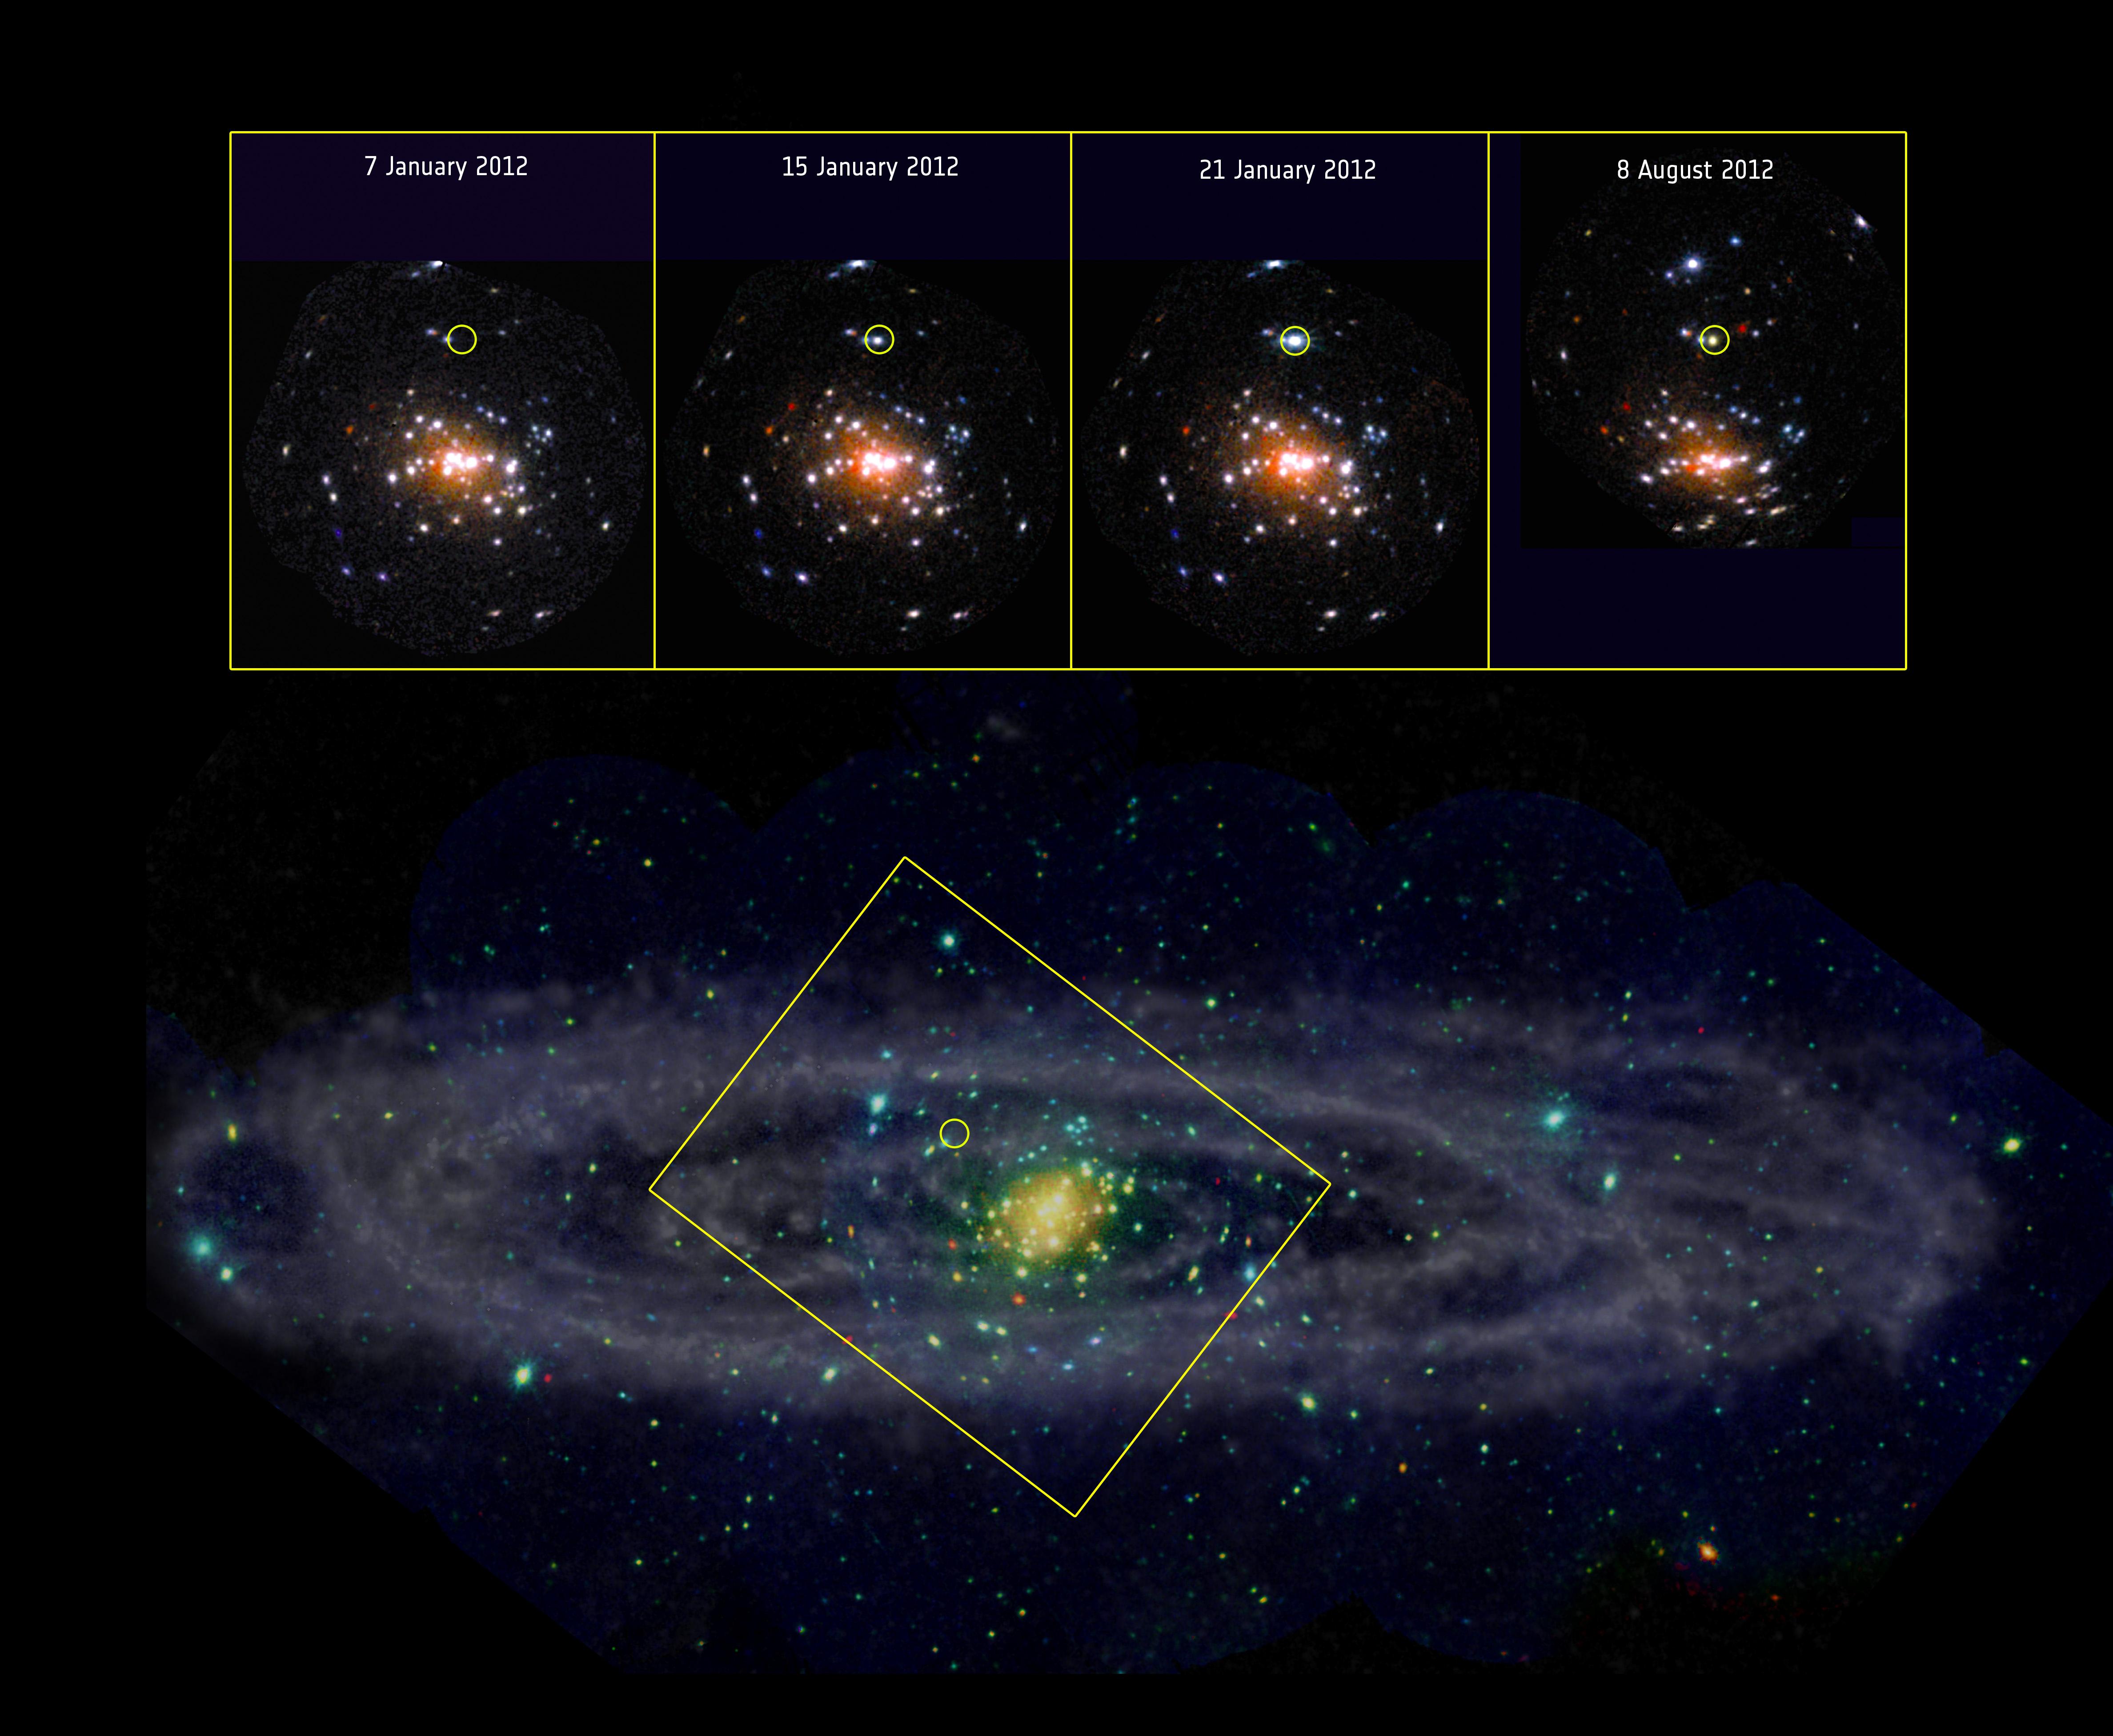 1567217030164-M31_XMM-Newton_New_Source_2012.jpg